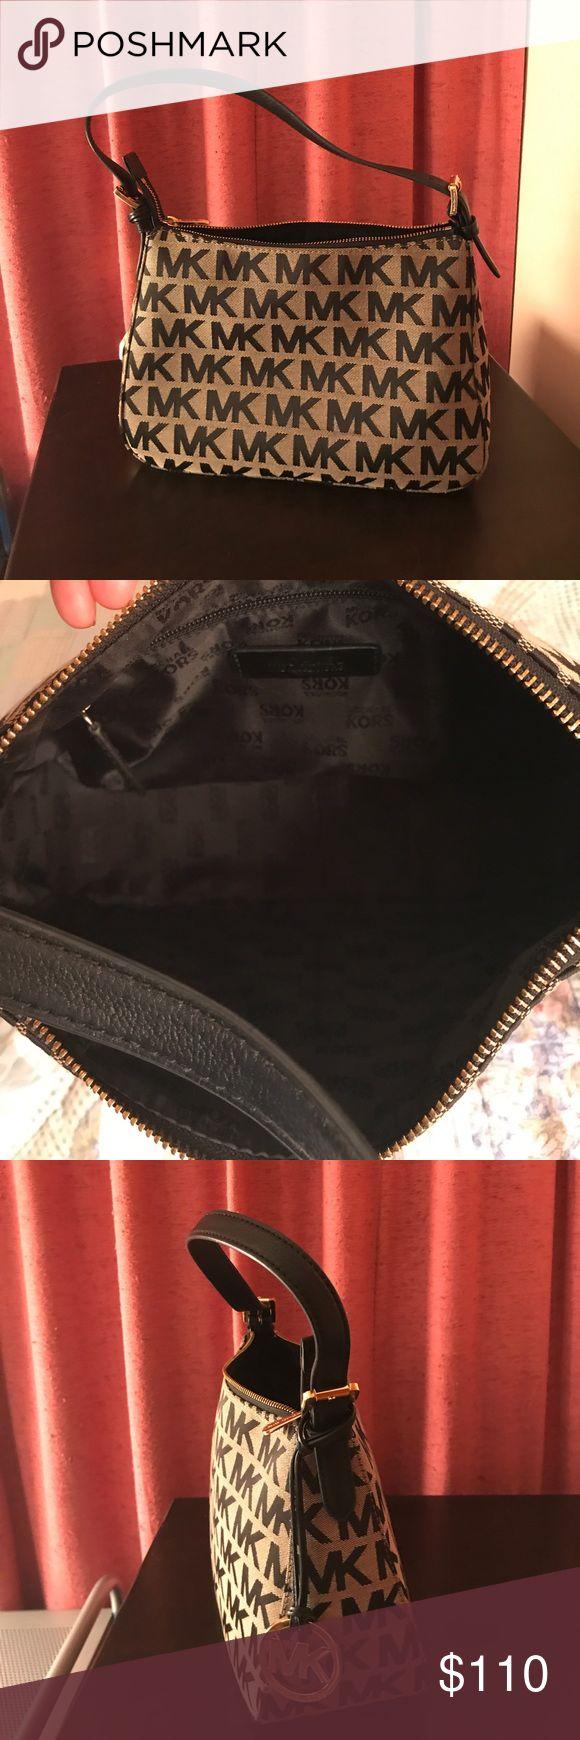 Michael Kors Hobo shoulder bag In excellent used condition. Michael Kors Bags Hobos